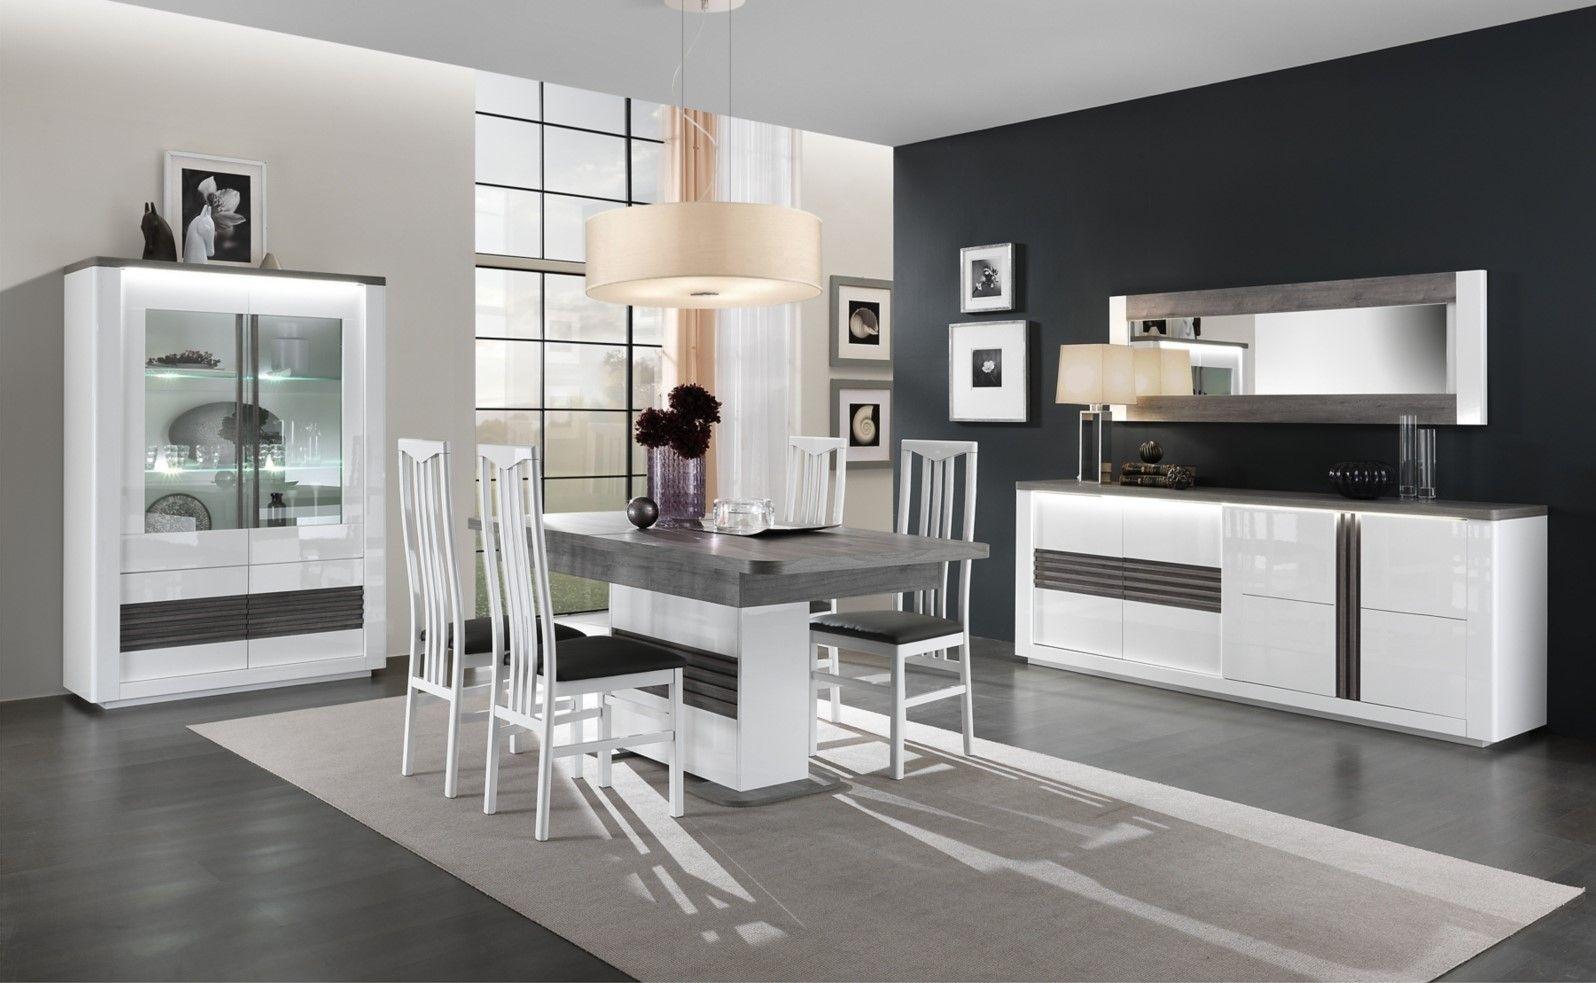 Table L180 All Vertigo Blanc Chene Gris Pas Cher Prix Table But 599 99 Ttc Iziva Table Tabledesejour Tablerectangulaire Tablepascher Tableb Huisstijl